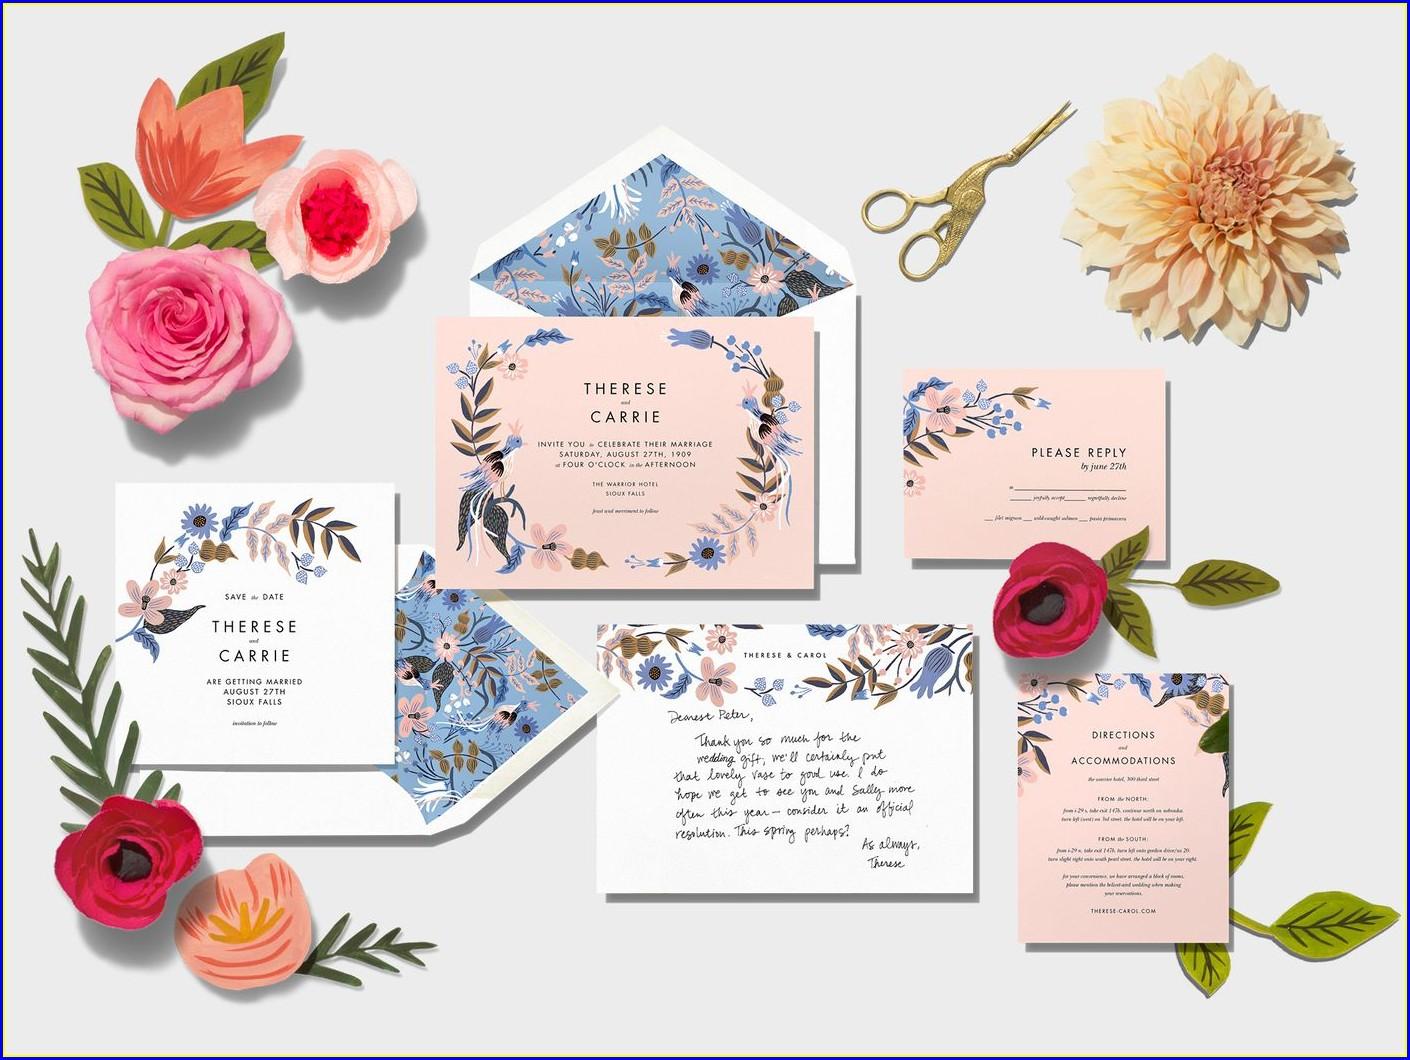 Paperless Post Wedding Invitations Cost